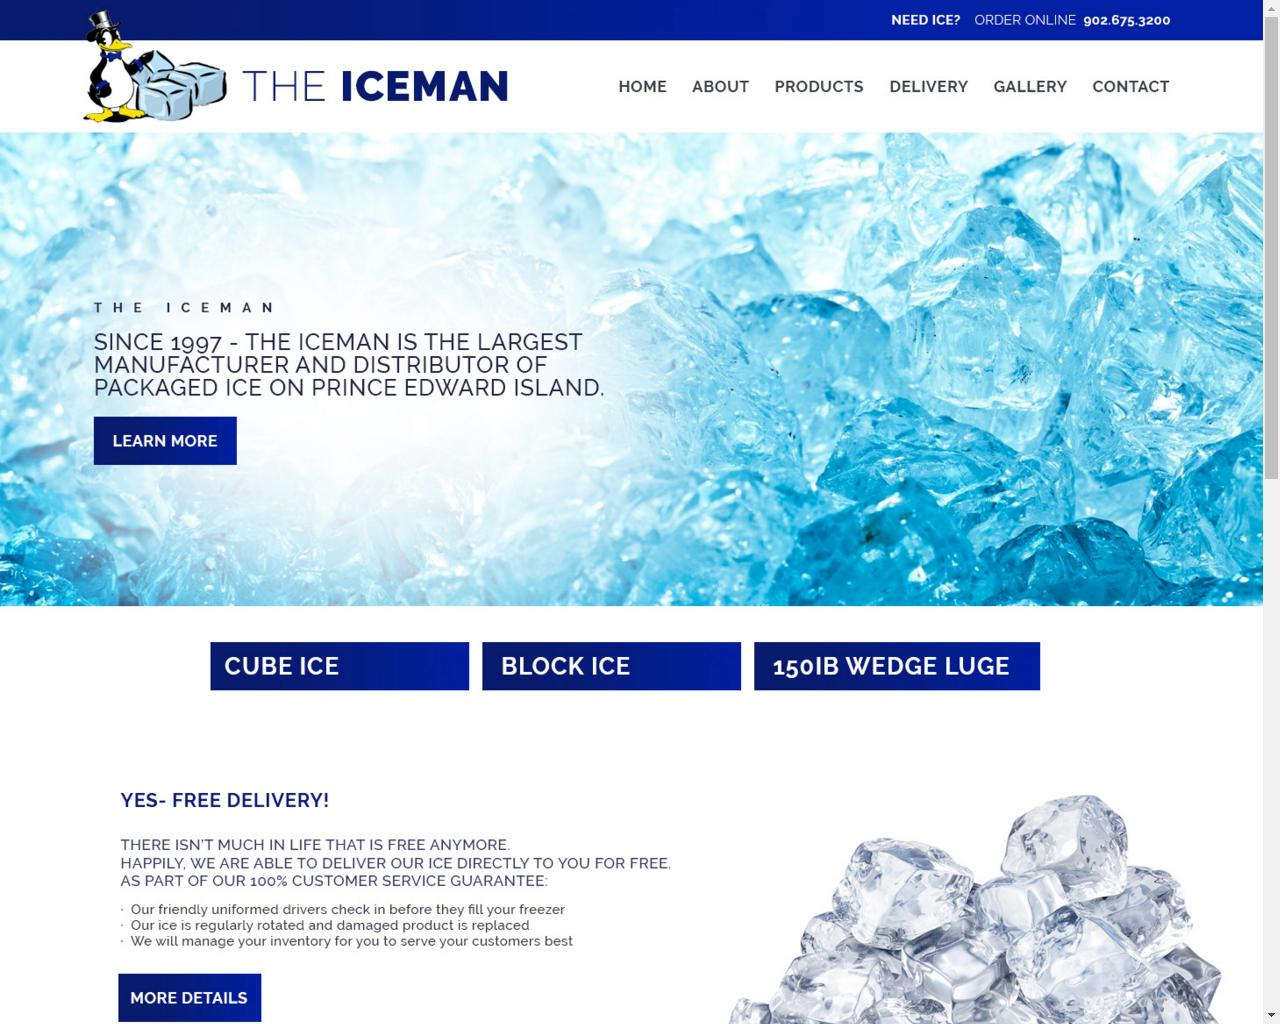 The ICEMan PEI